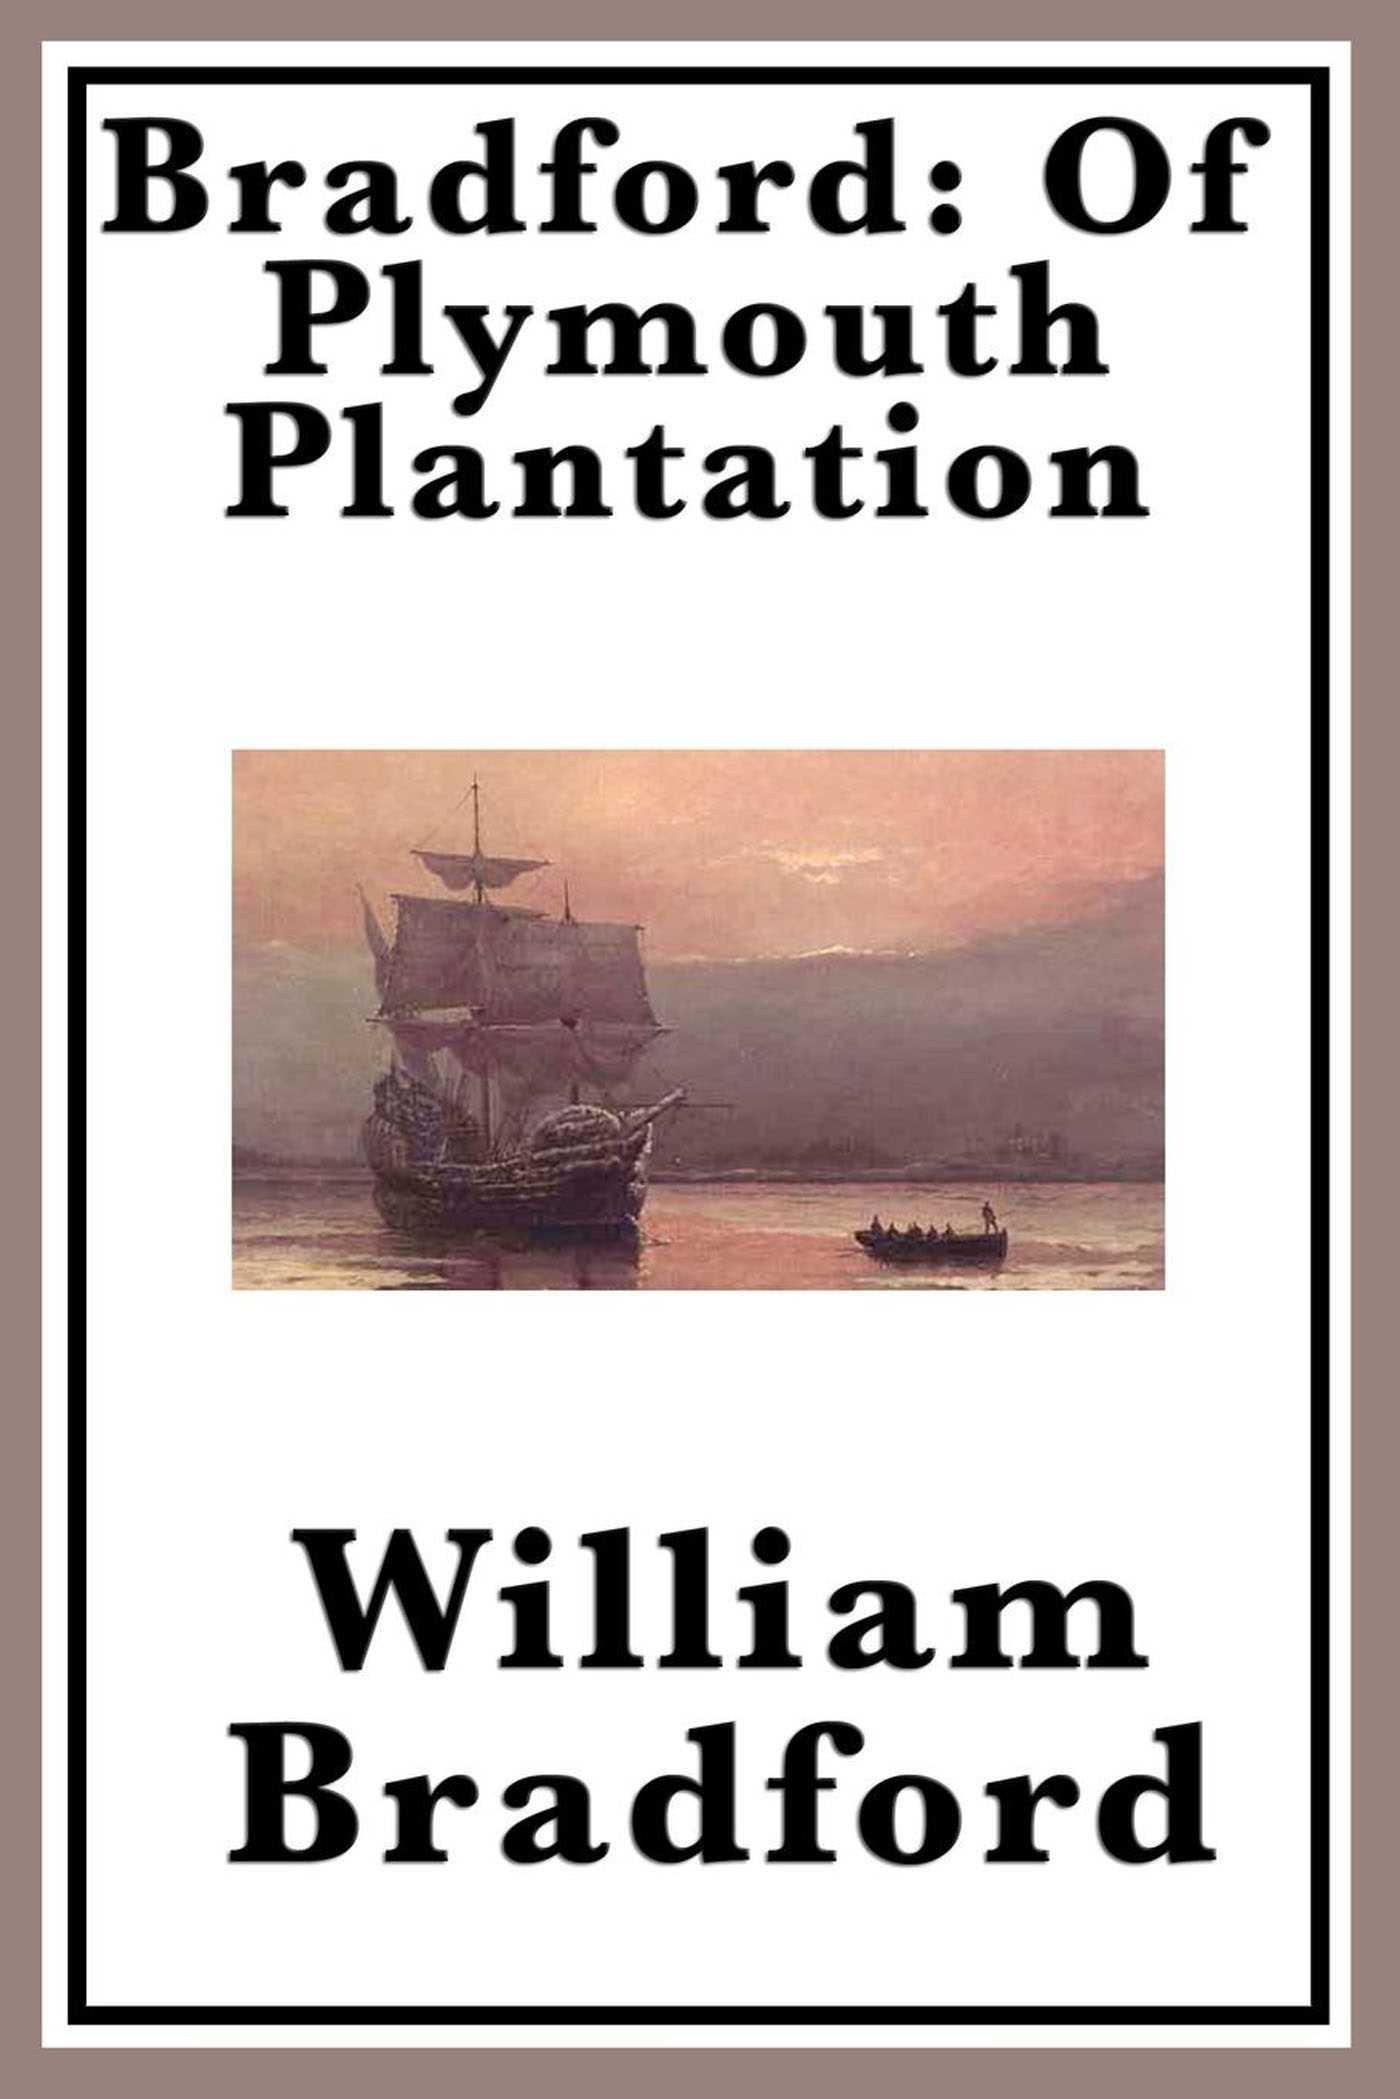 Of Plymouth Plantation eBook by William Bradford ...